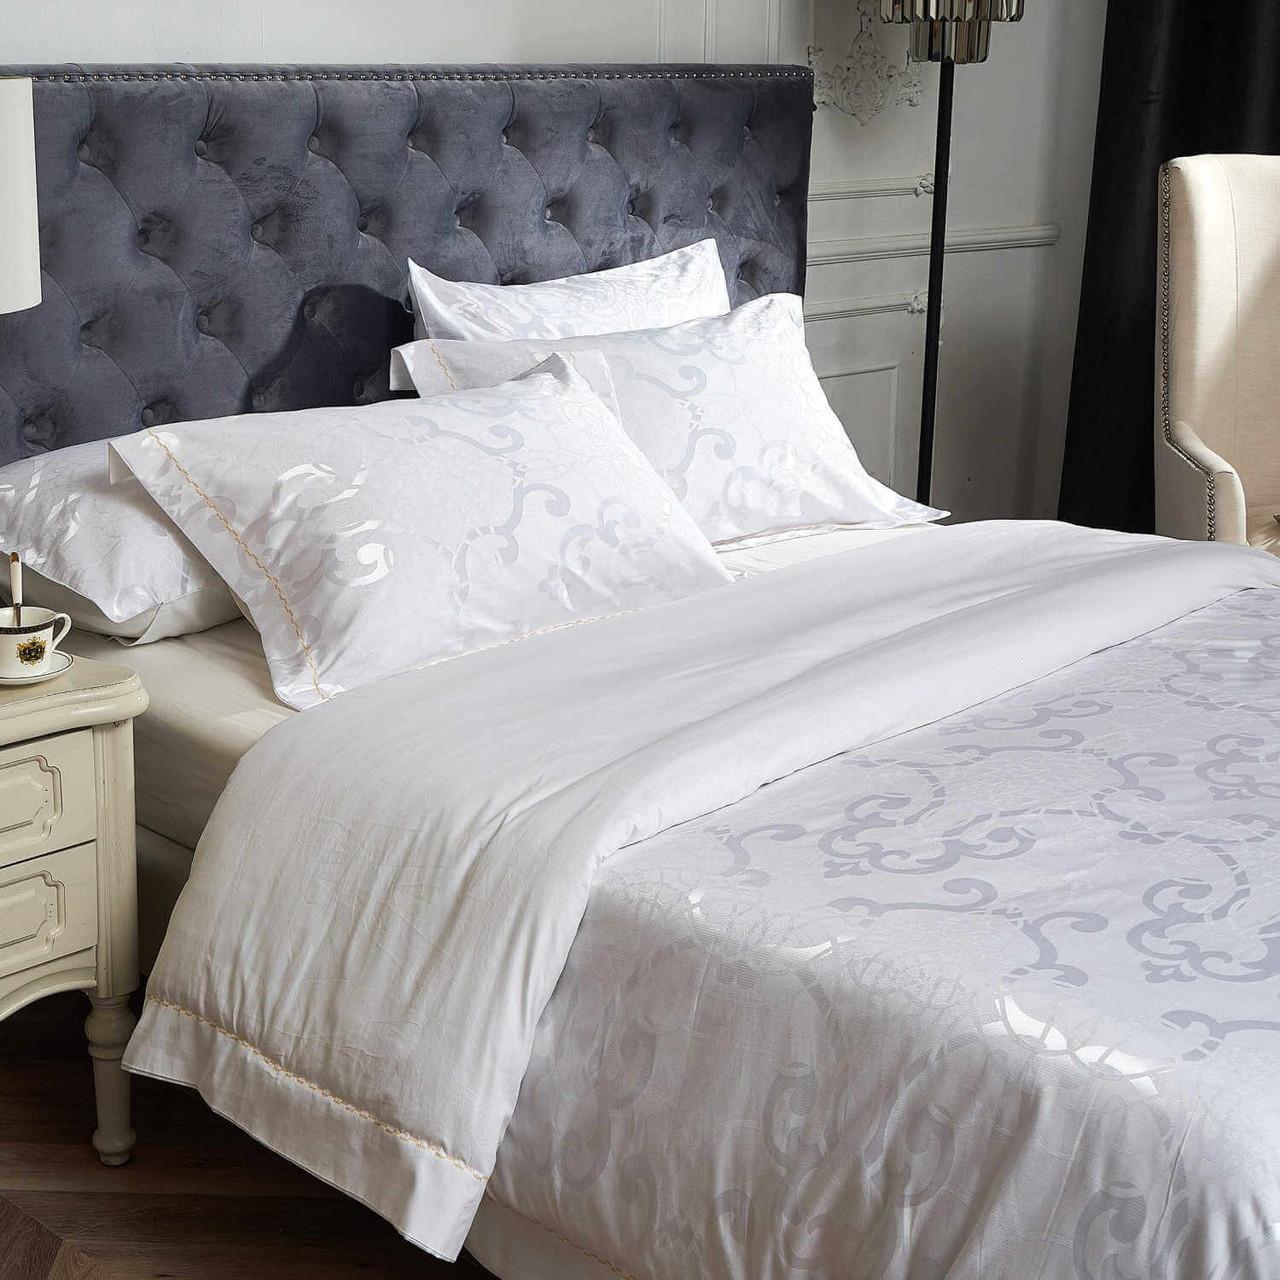 Dropshipping Wholesale Jacquard Bedding Set DM806Q